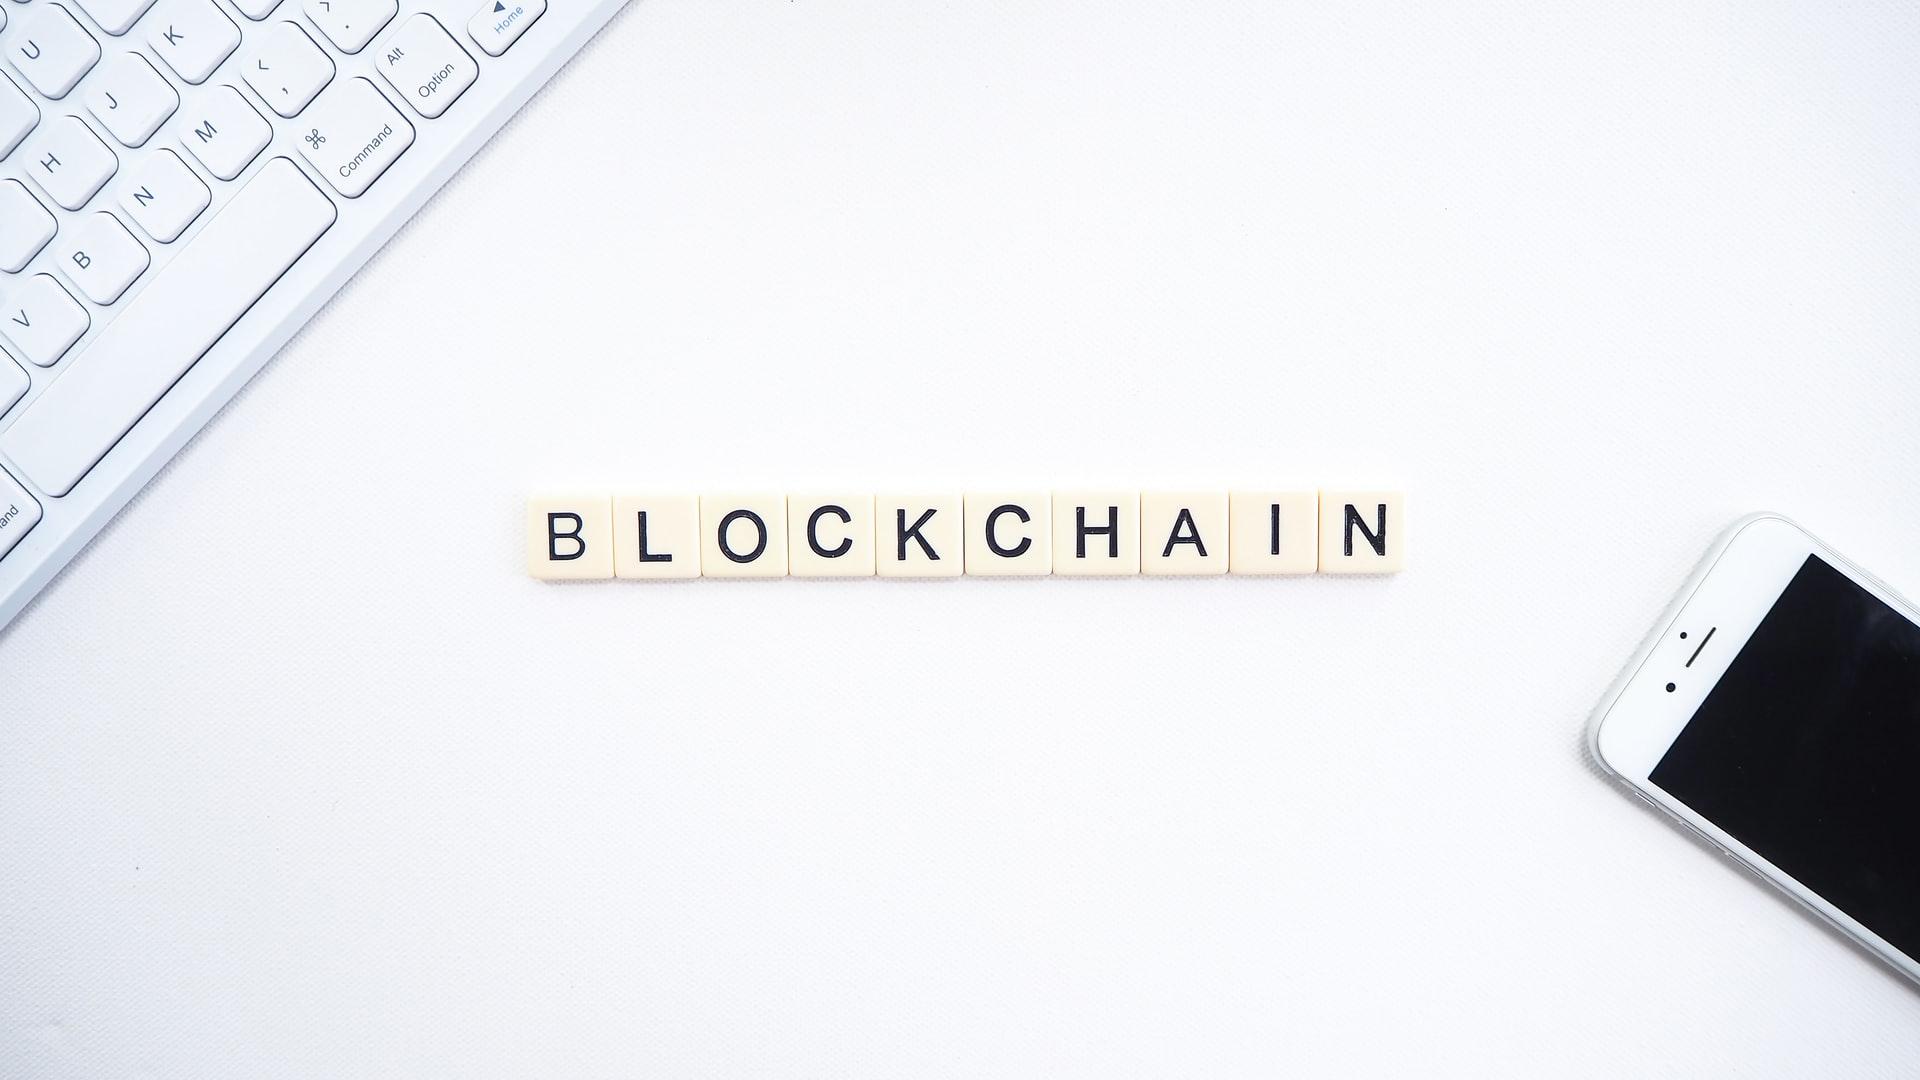 Blockchain Schriftzug